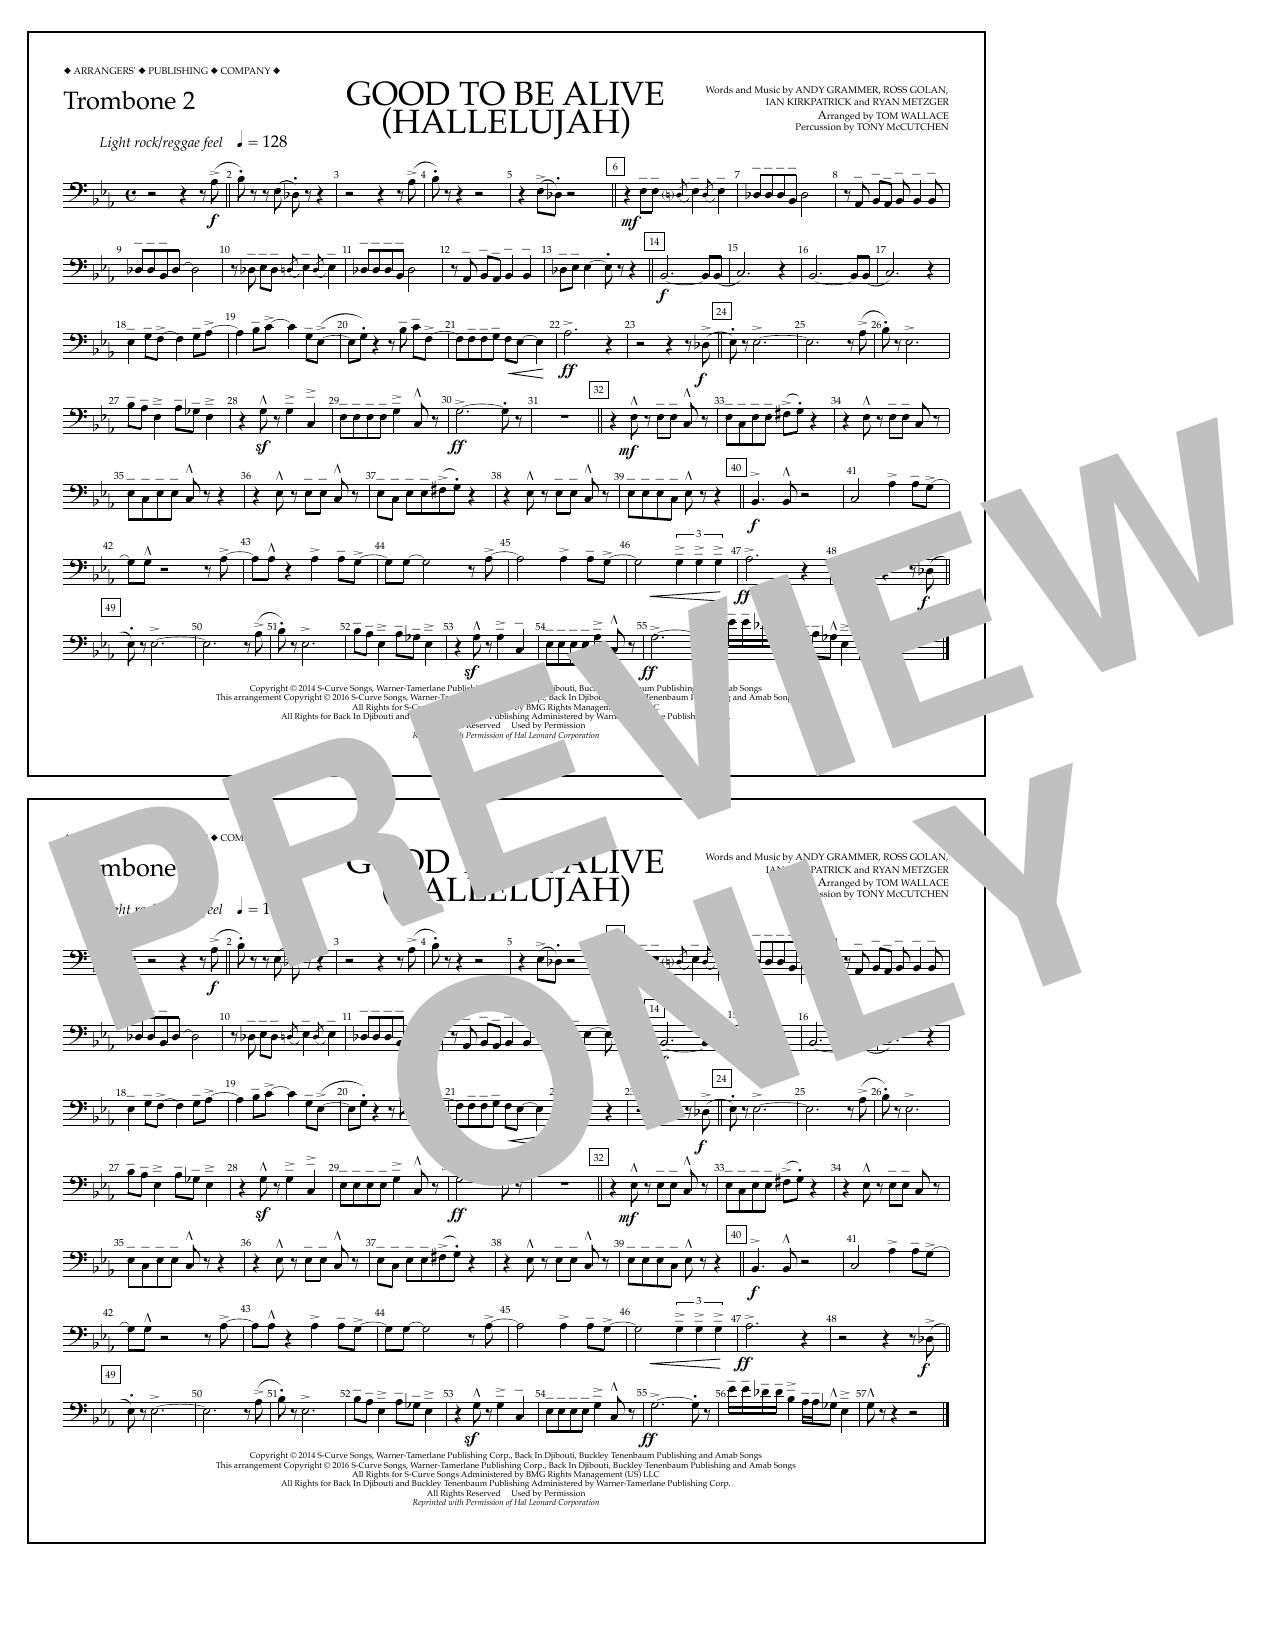 Andy Grammer - Good to Be Alive (Hallelujah) - Trombone 2